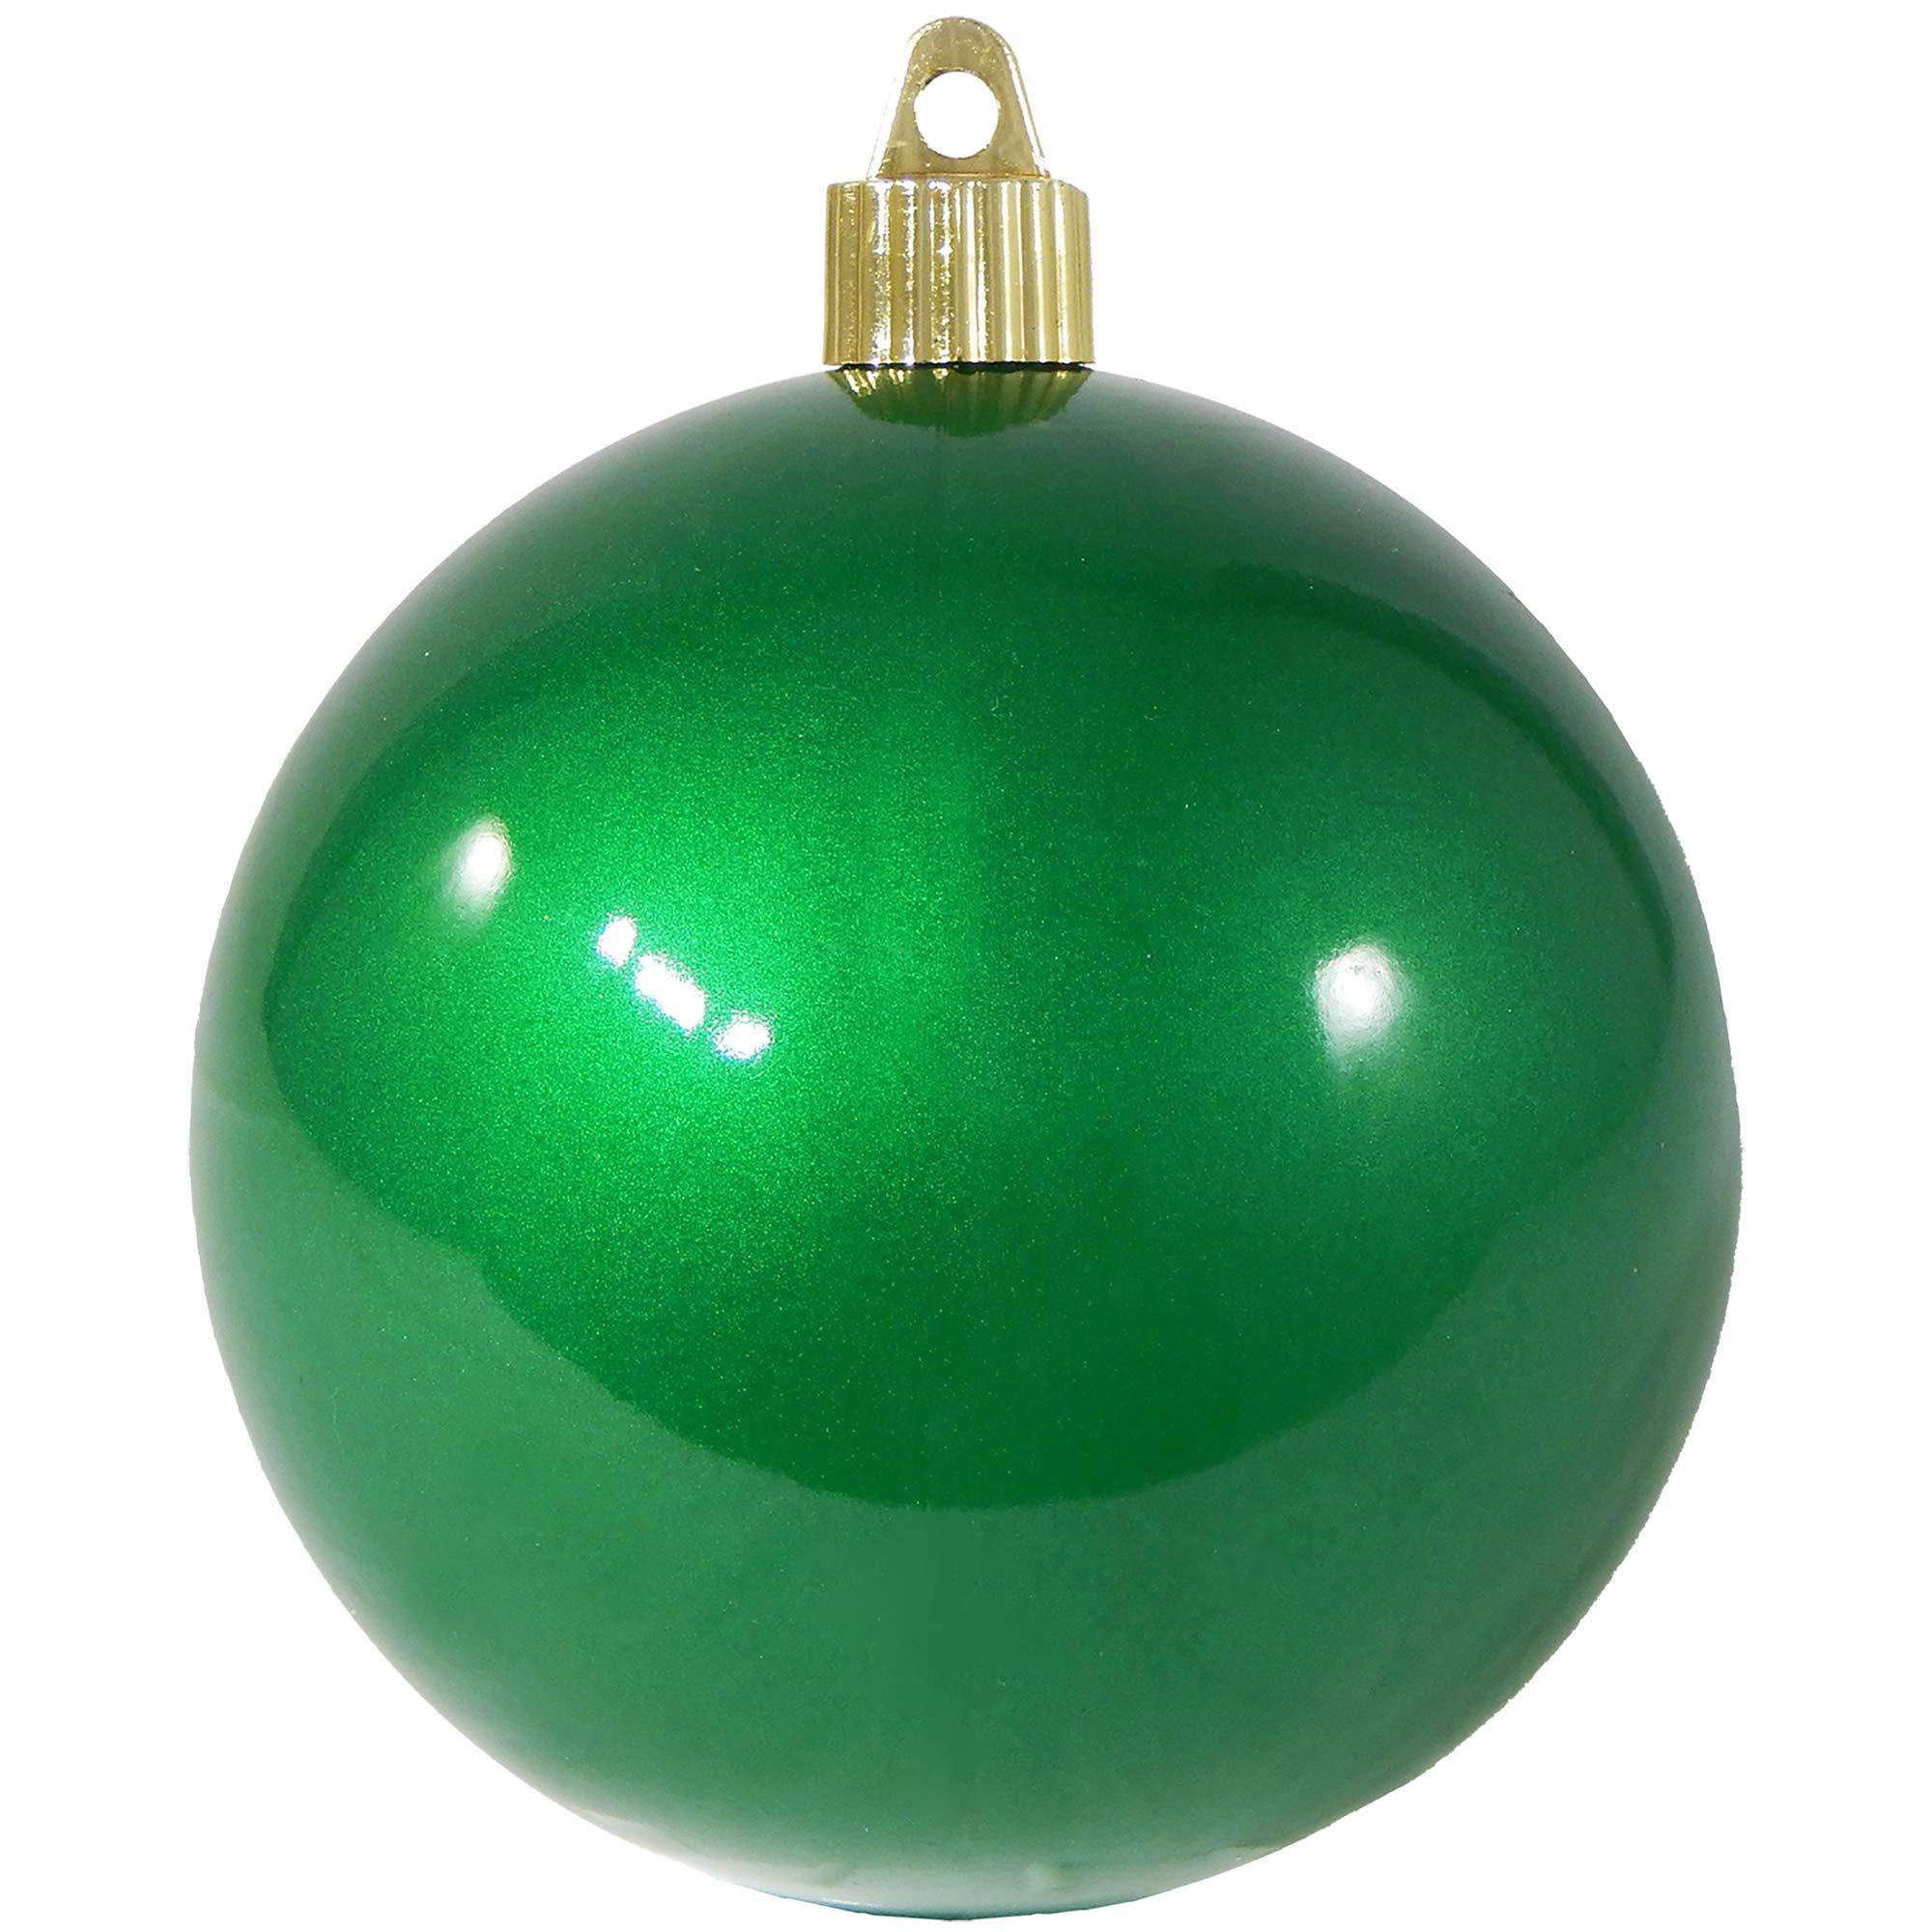 Christmas By Krebs CBK72976 Shatterproof UV-Resistant Christmas Ball Ornaments 4'' Candy Green 48 Piece